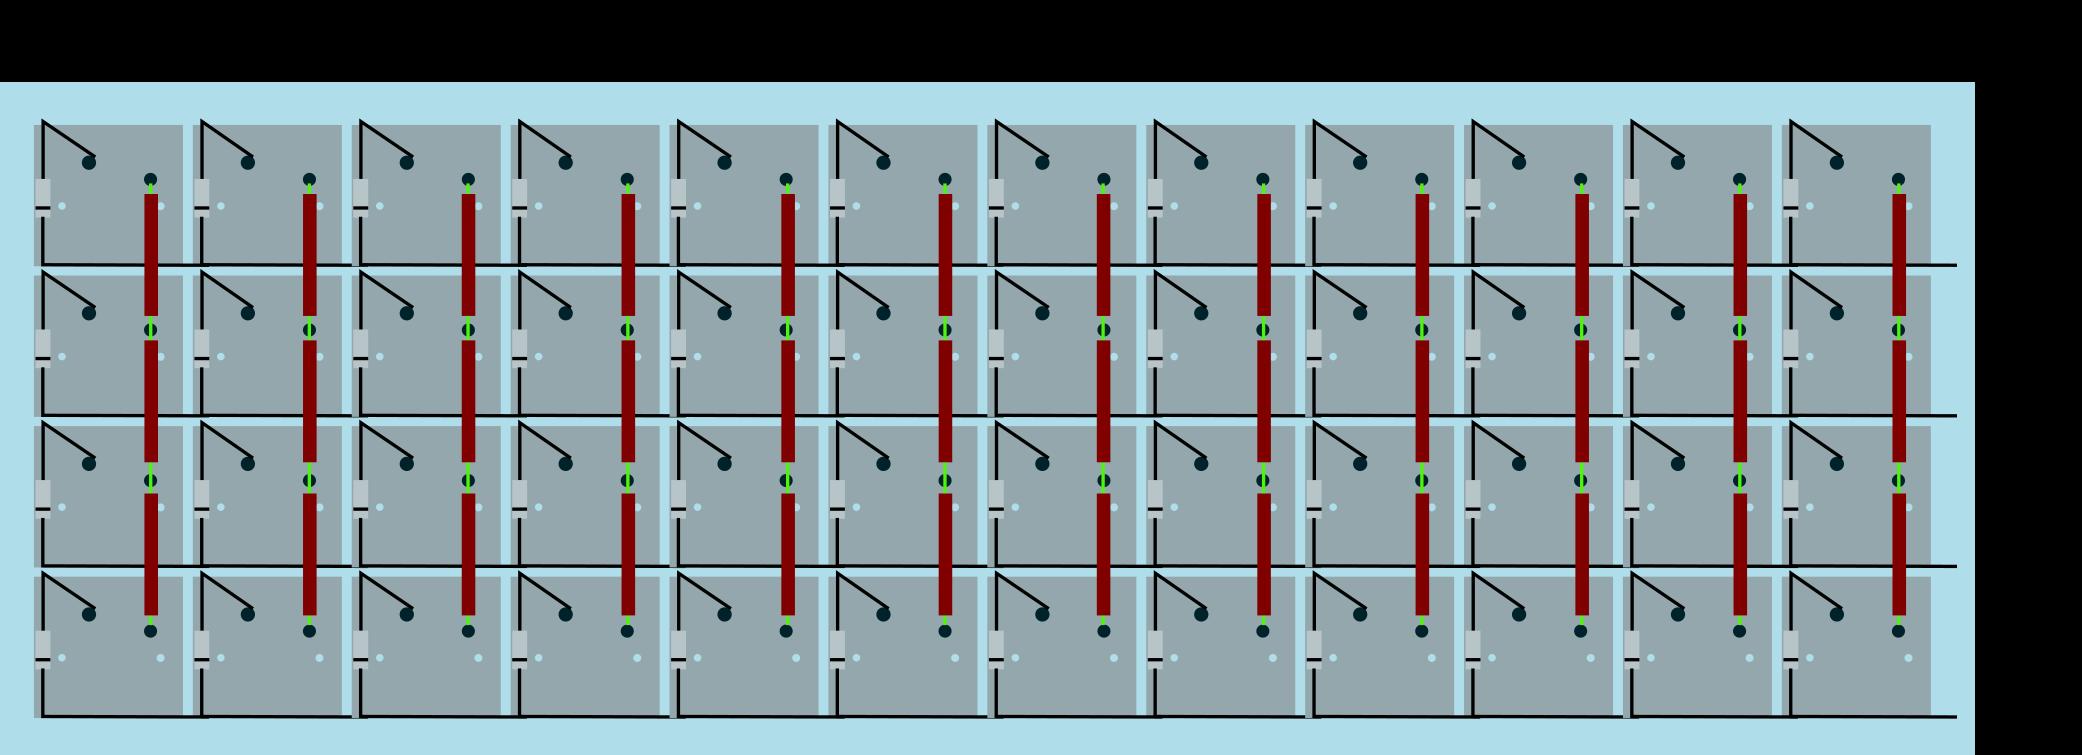 Keyboard Matrix Wiring Diagram Schematic Diagrams Usb How To Hand Wire A Planck Midi